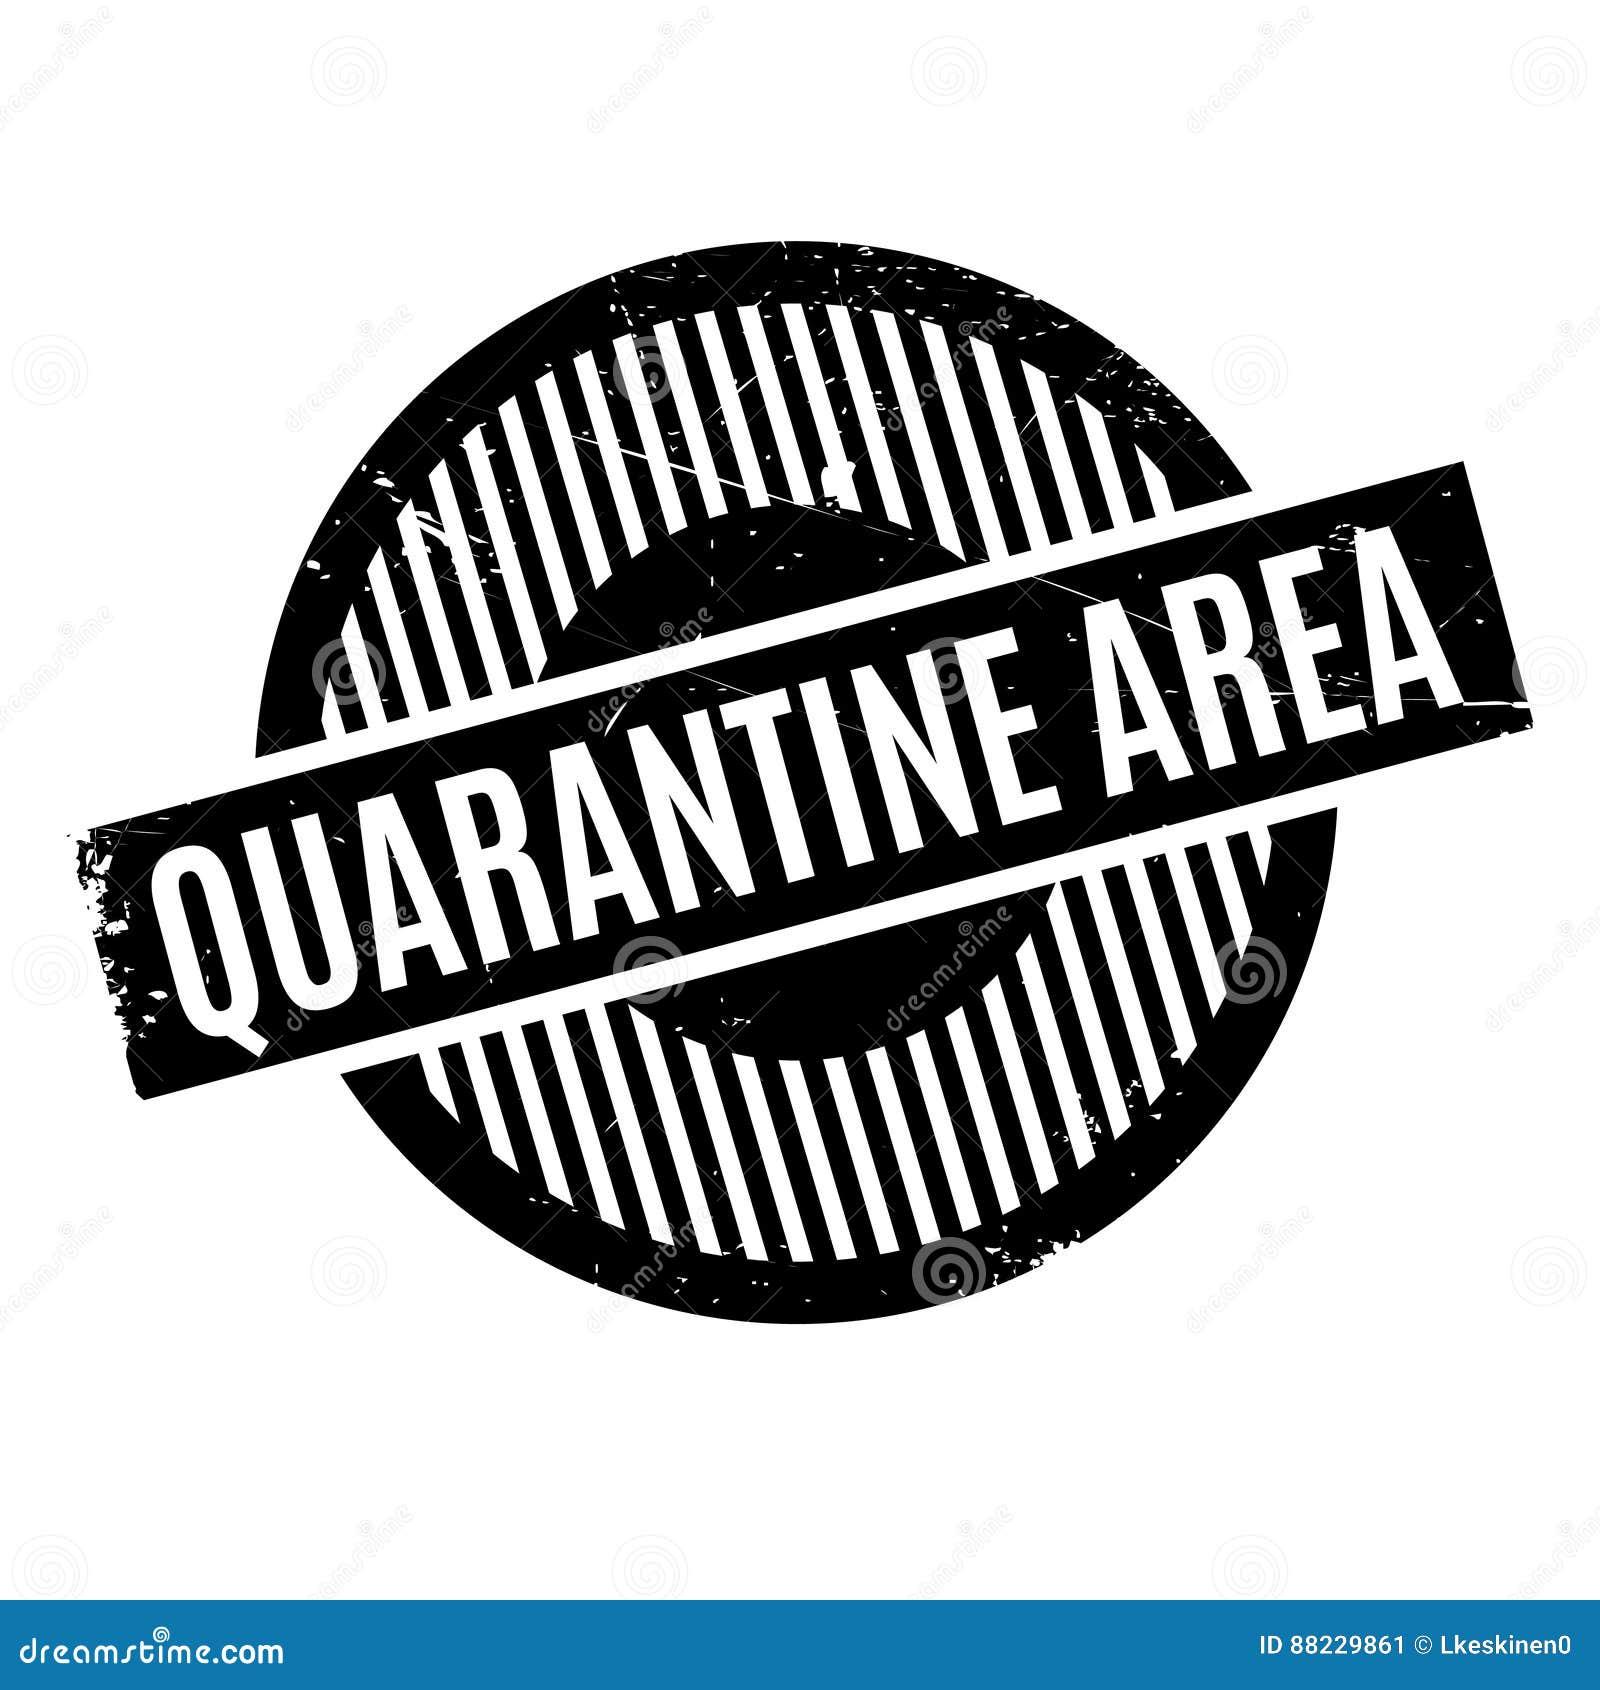 Quarantine Area Rubber Stamp Stock Image Image Of Disease